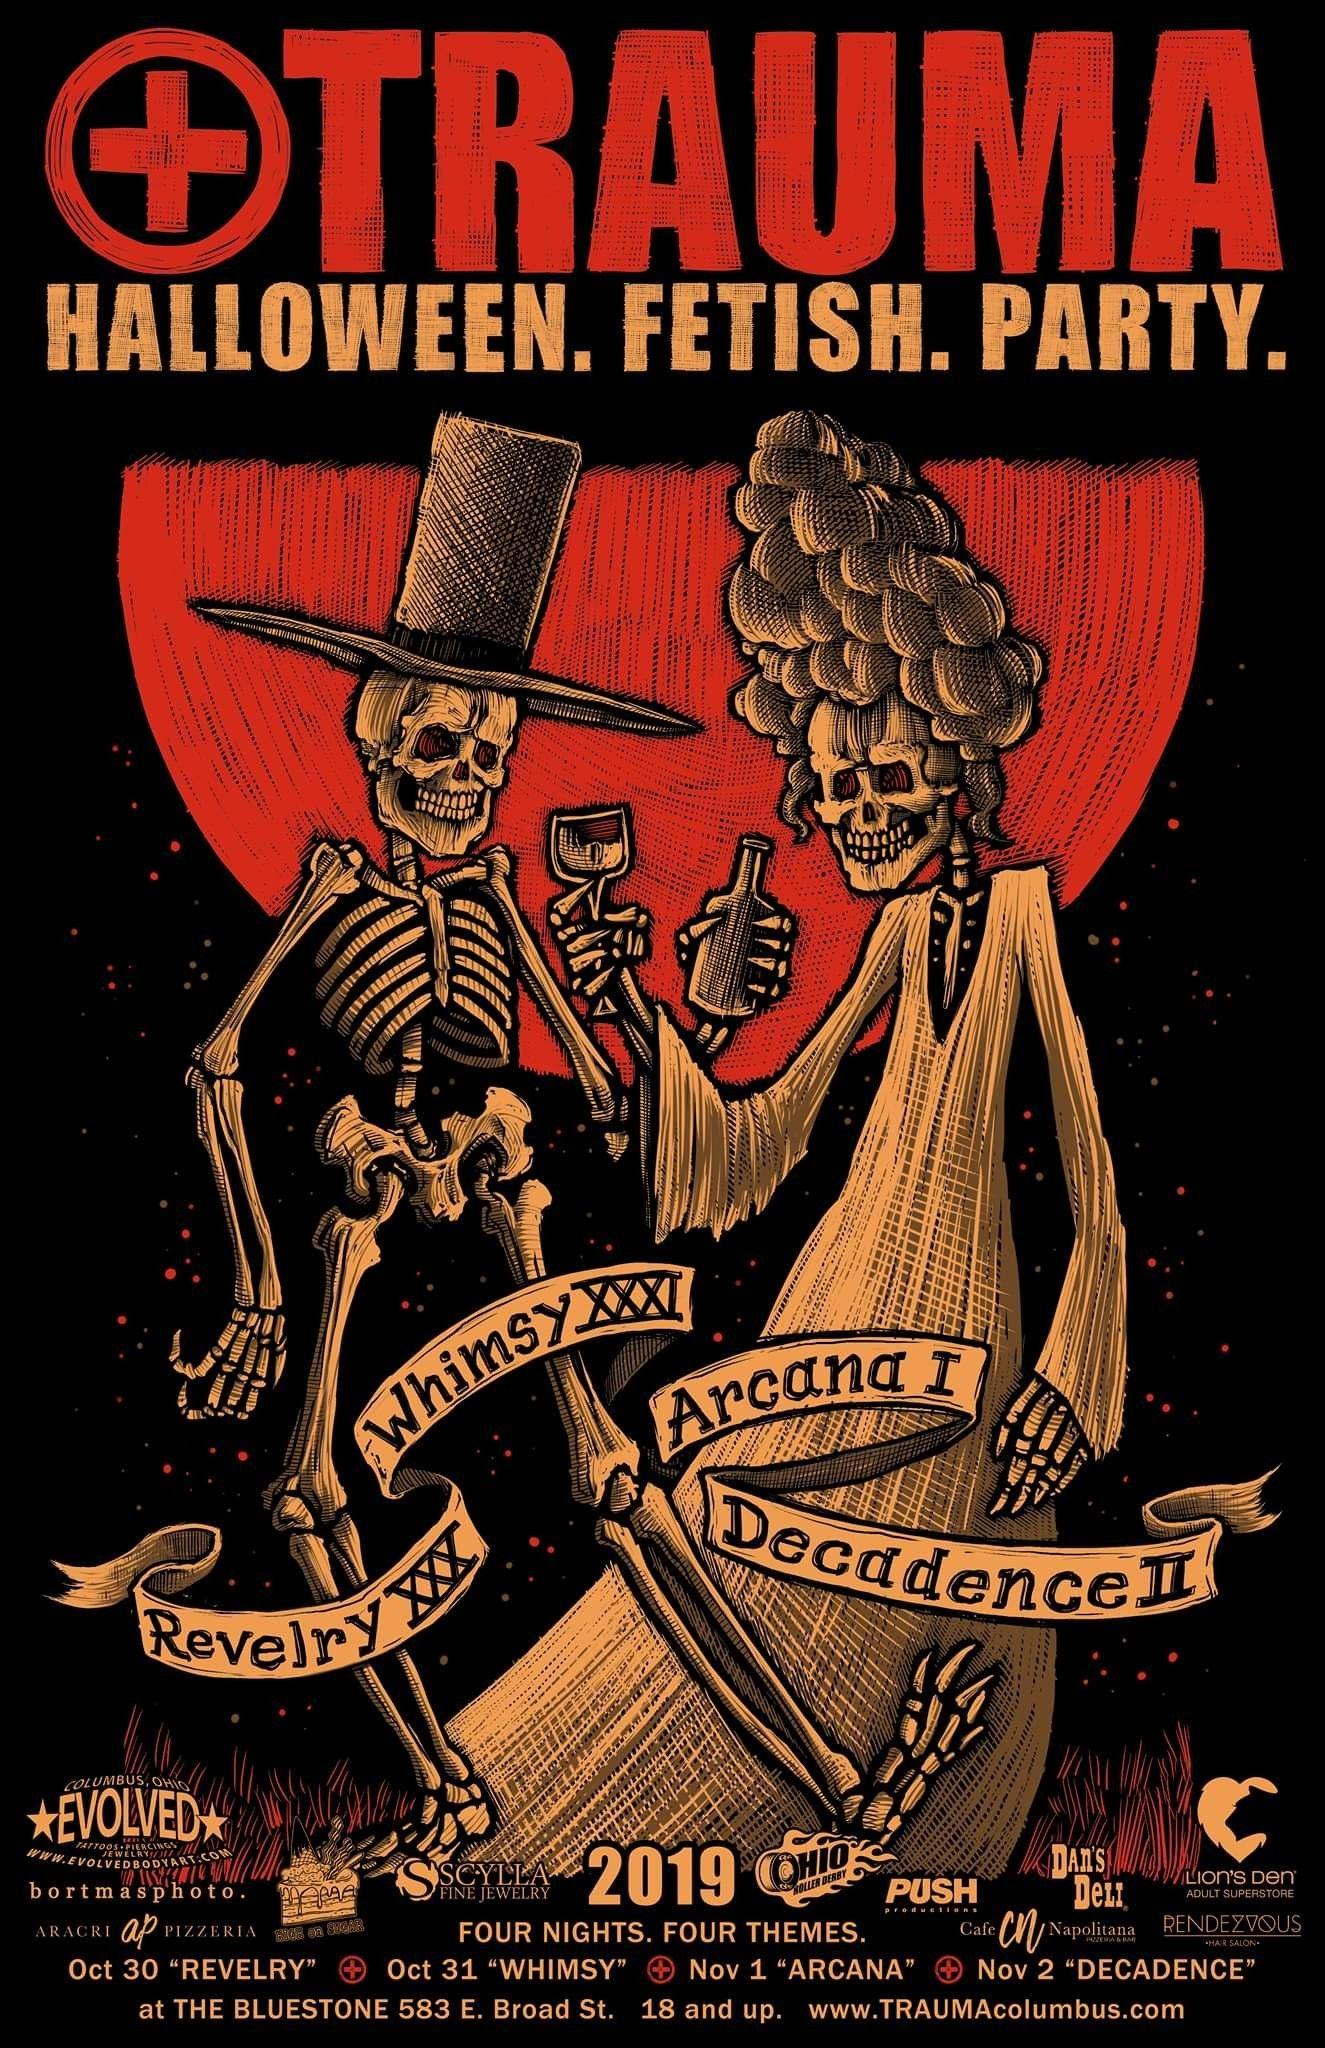 Halloween image by Shade Media on Shit I wanna share